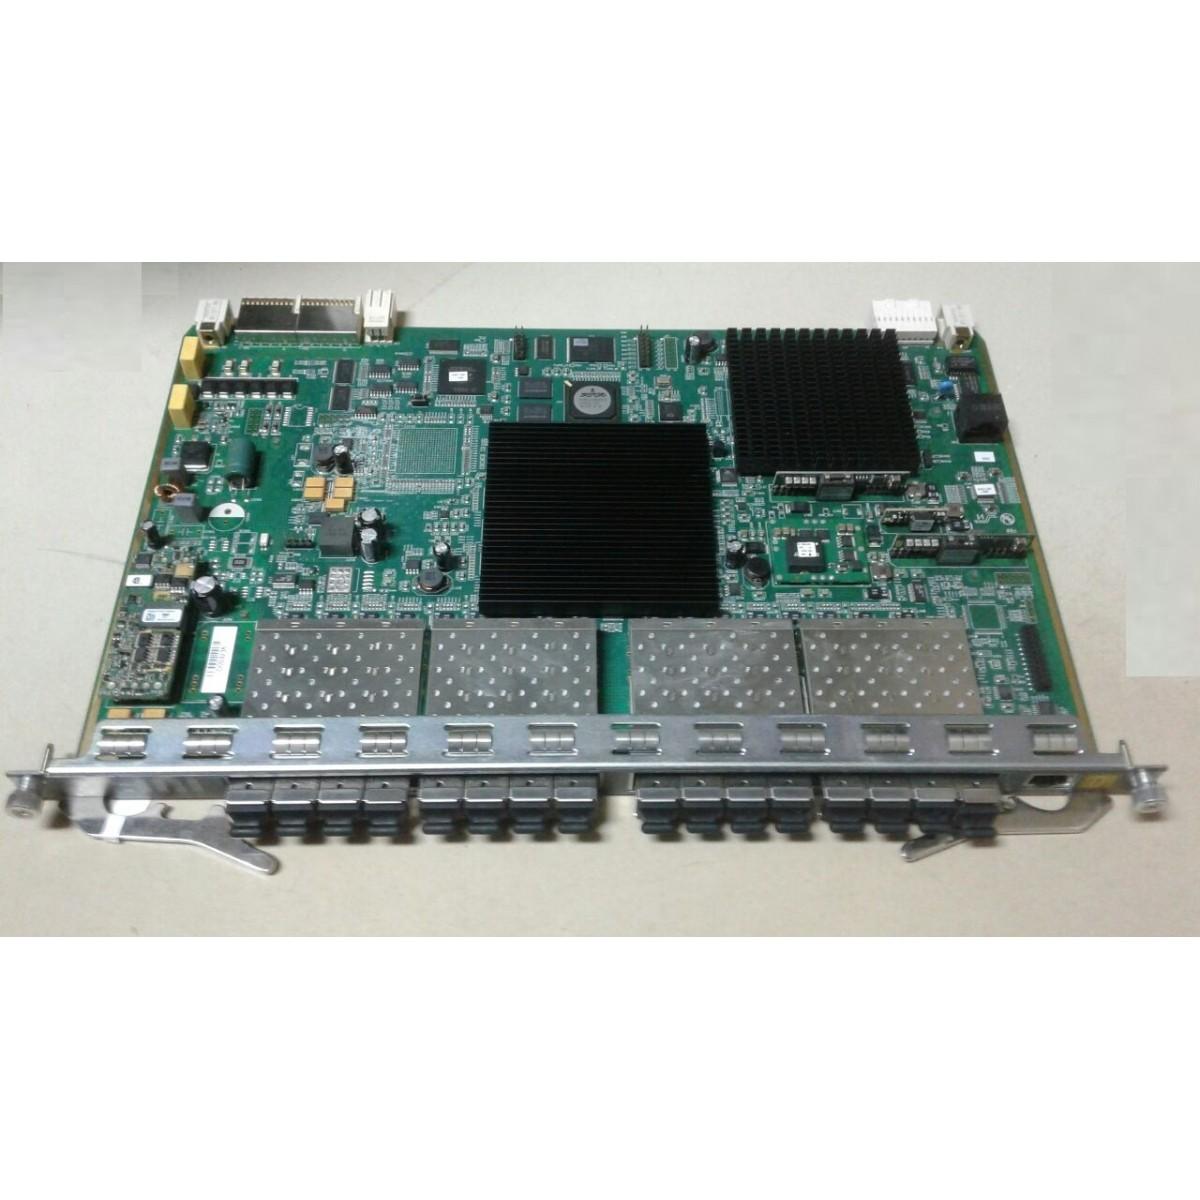 PLACA OLT GCOB GPON FIBERHOME 5516-010-OLT 16 PON C+  - TECTECH BRASIL COMPUTERS